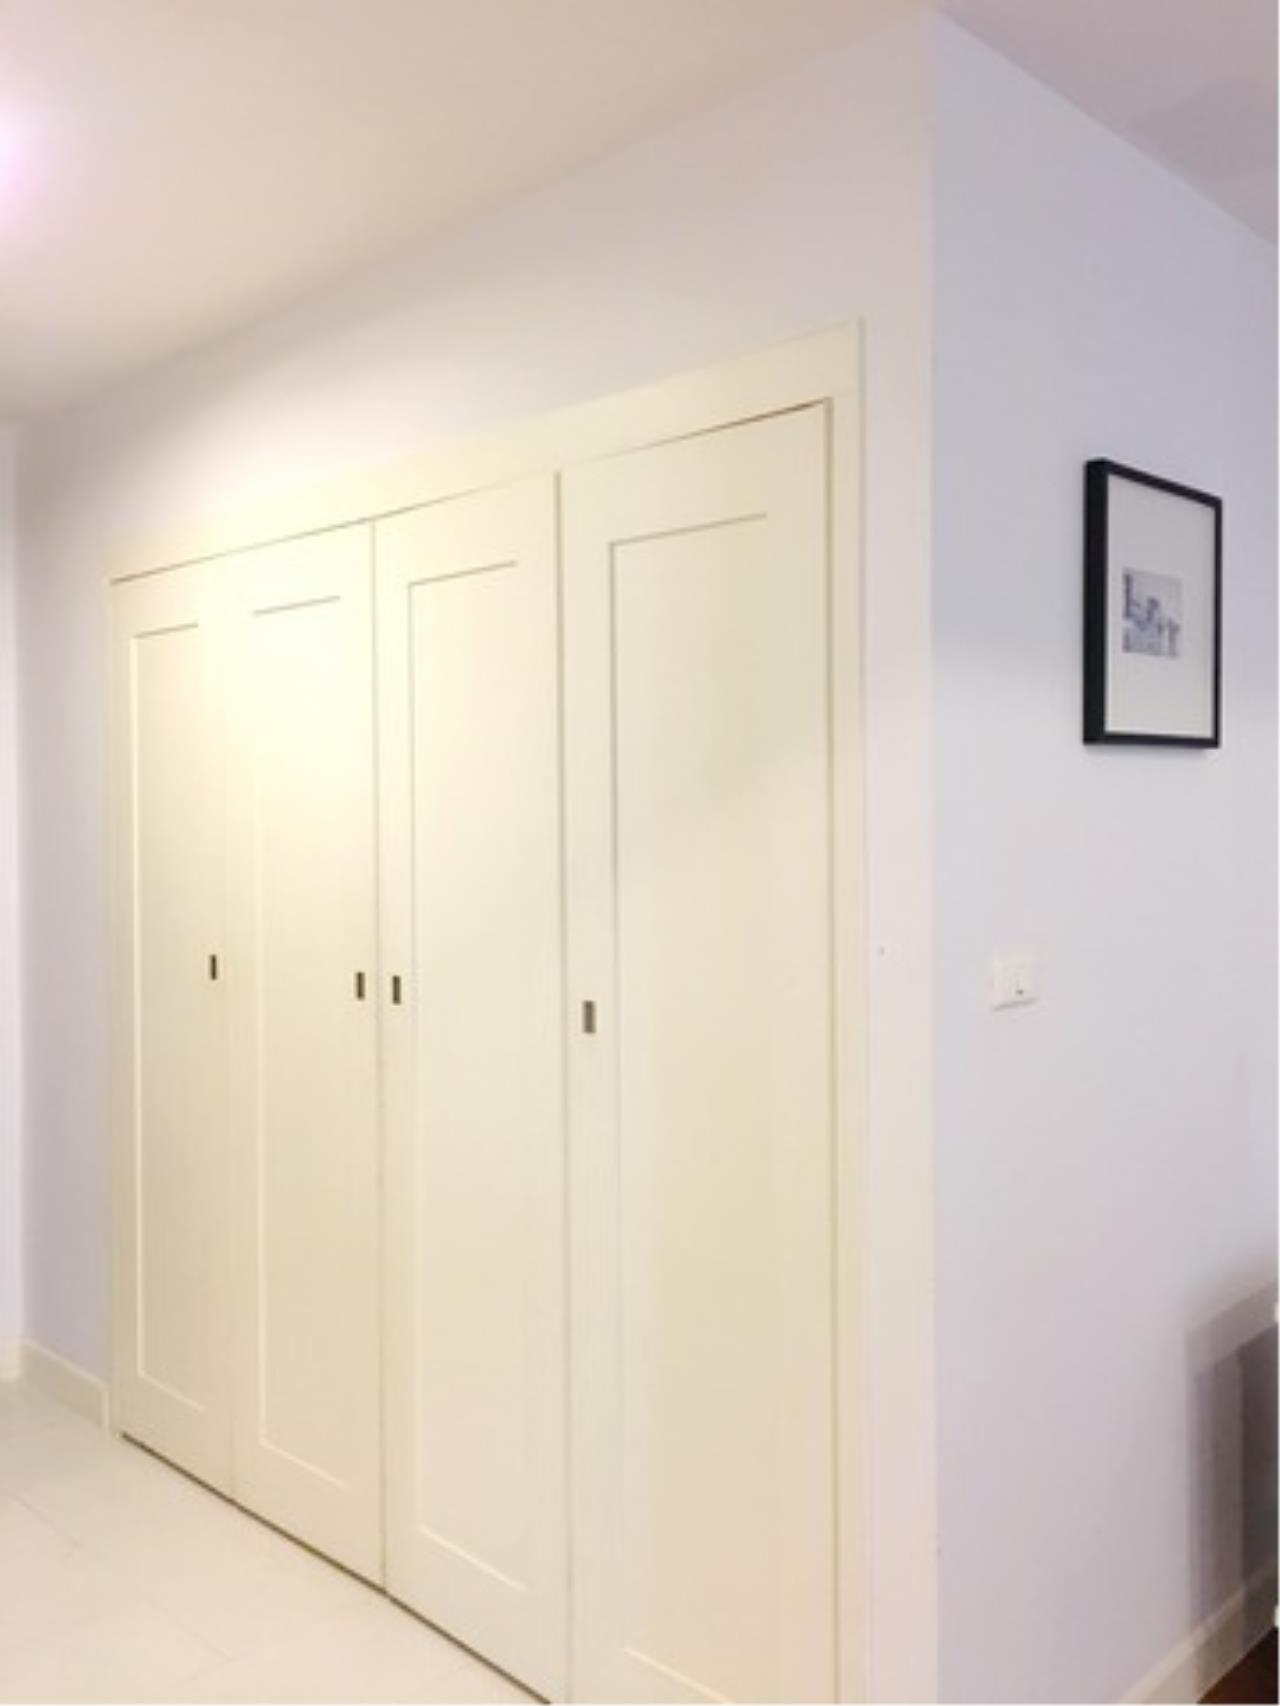 Ta (+66 9 5935 1592) Agency's SALE Condo Siri Residence by Sansiri 2 Bed near BTS Prompong Thonglor Emporium Best Price (163,000B/sqm) 13